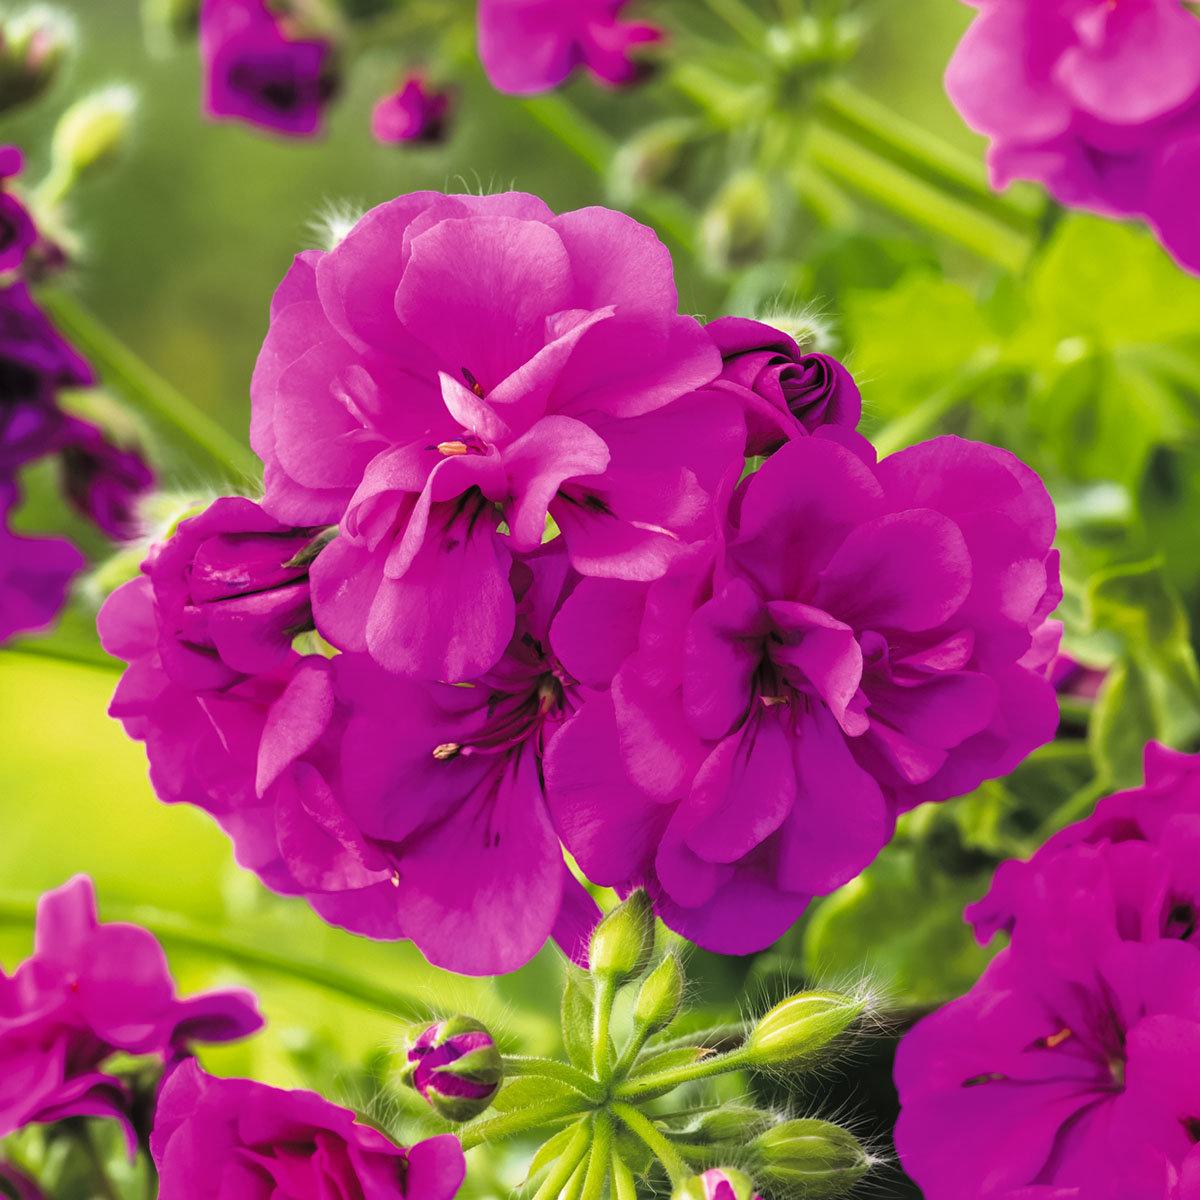 Violette Hänge-Geranie  Amelit, im ca. 12 cm-Topf | #2